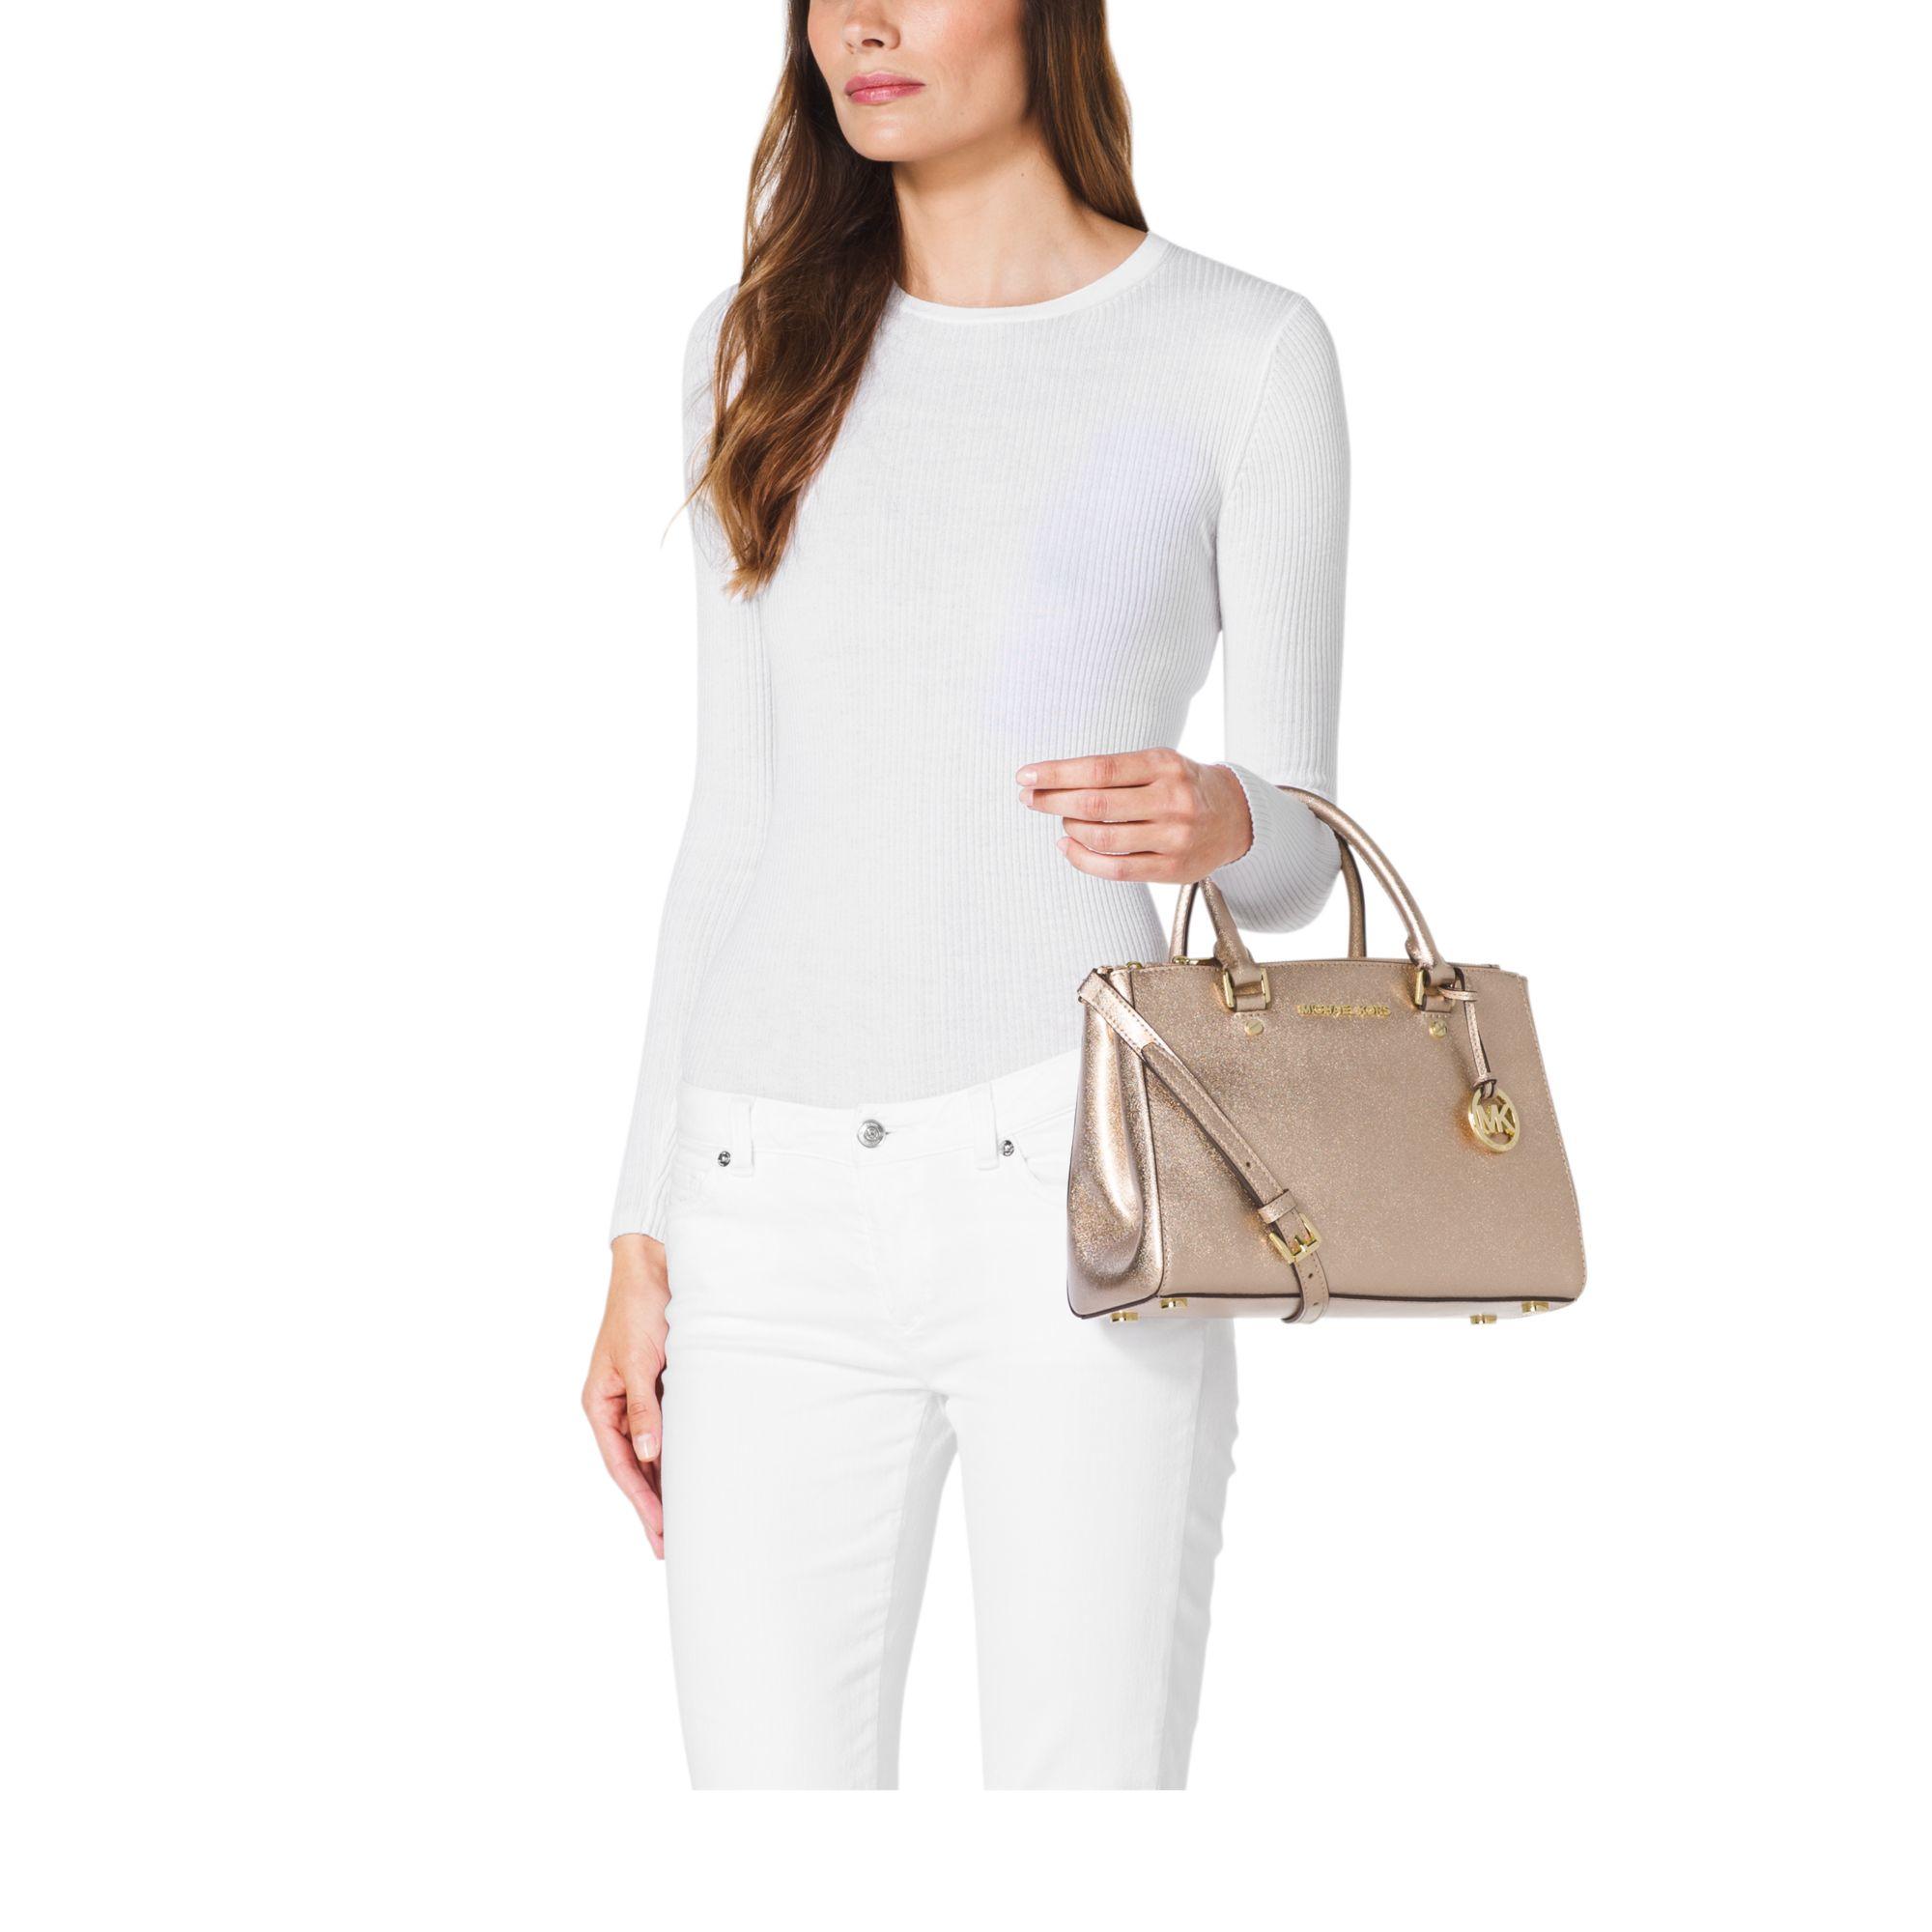 eafb91f616 ... medium satchel handbag black aac9e 4c6b0  canada lyst michael kors  sutton small metallic leather satchel in metallic b0c25 87997